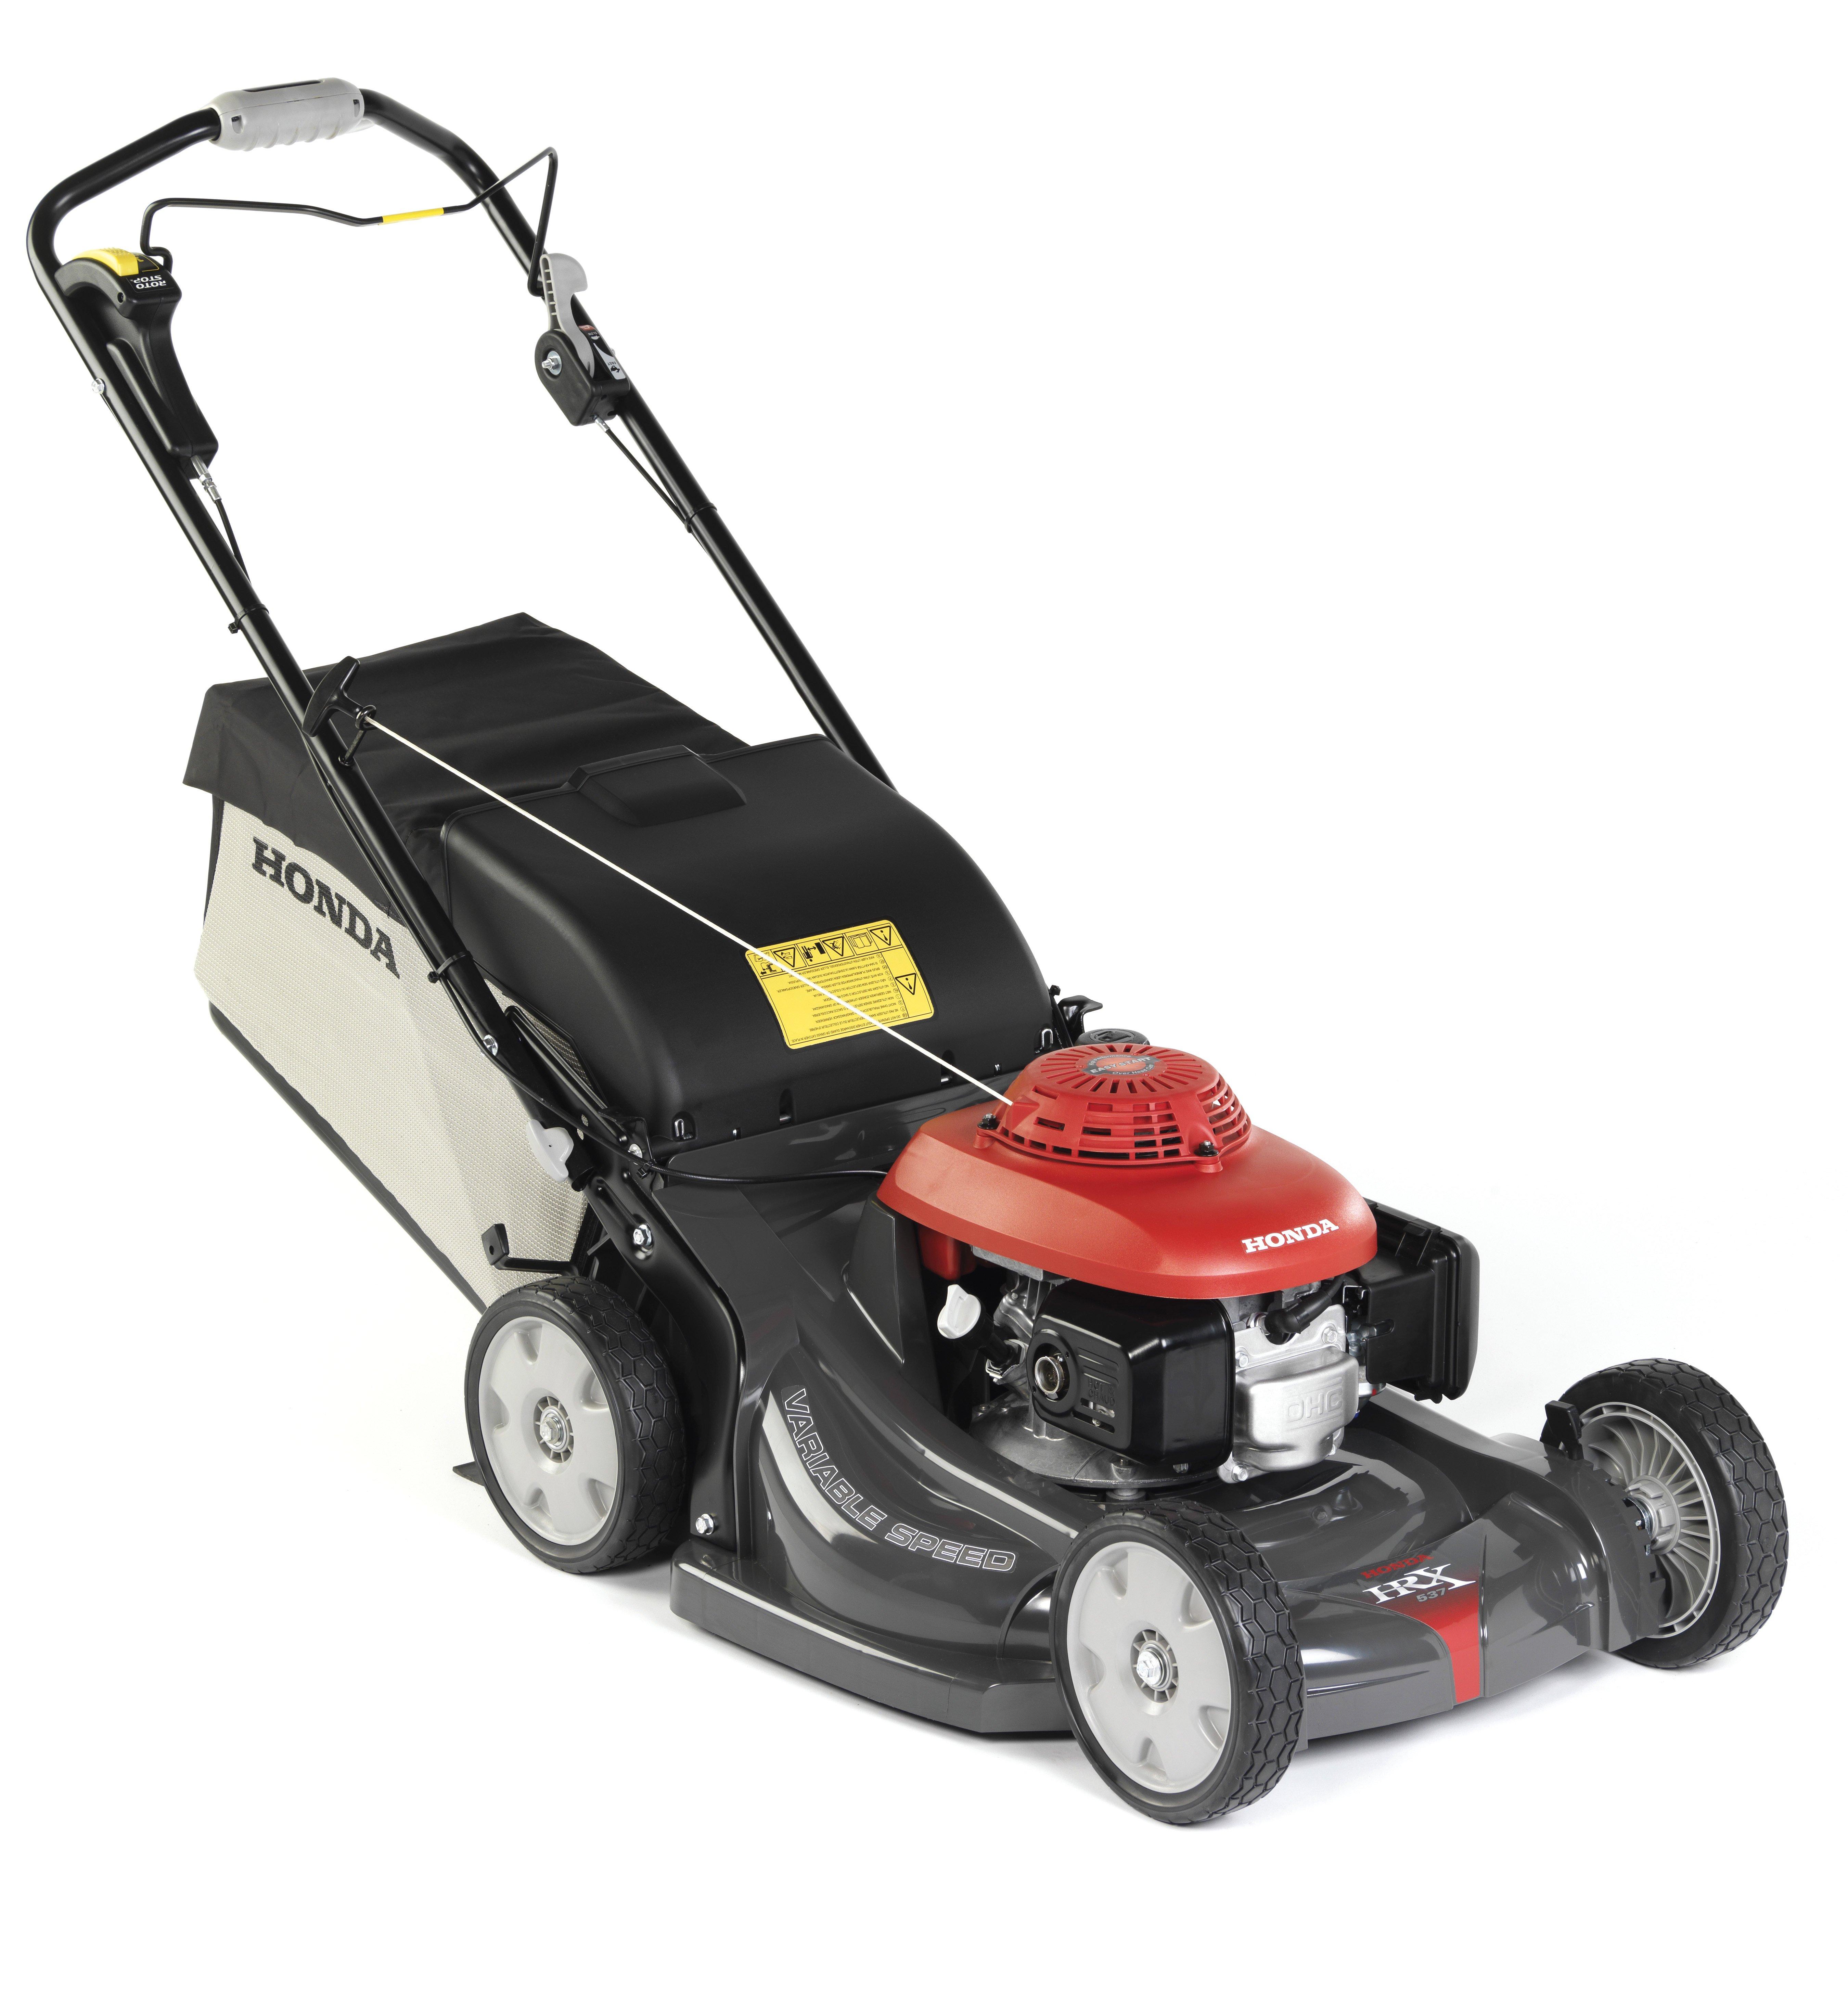 Easy to use garden mower